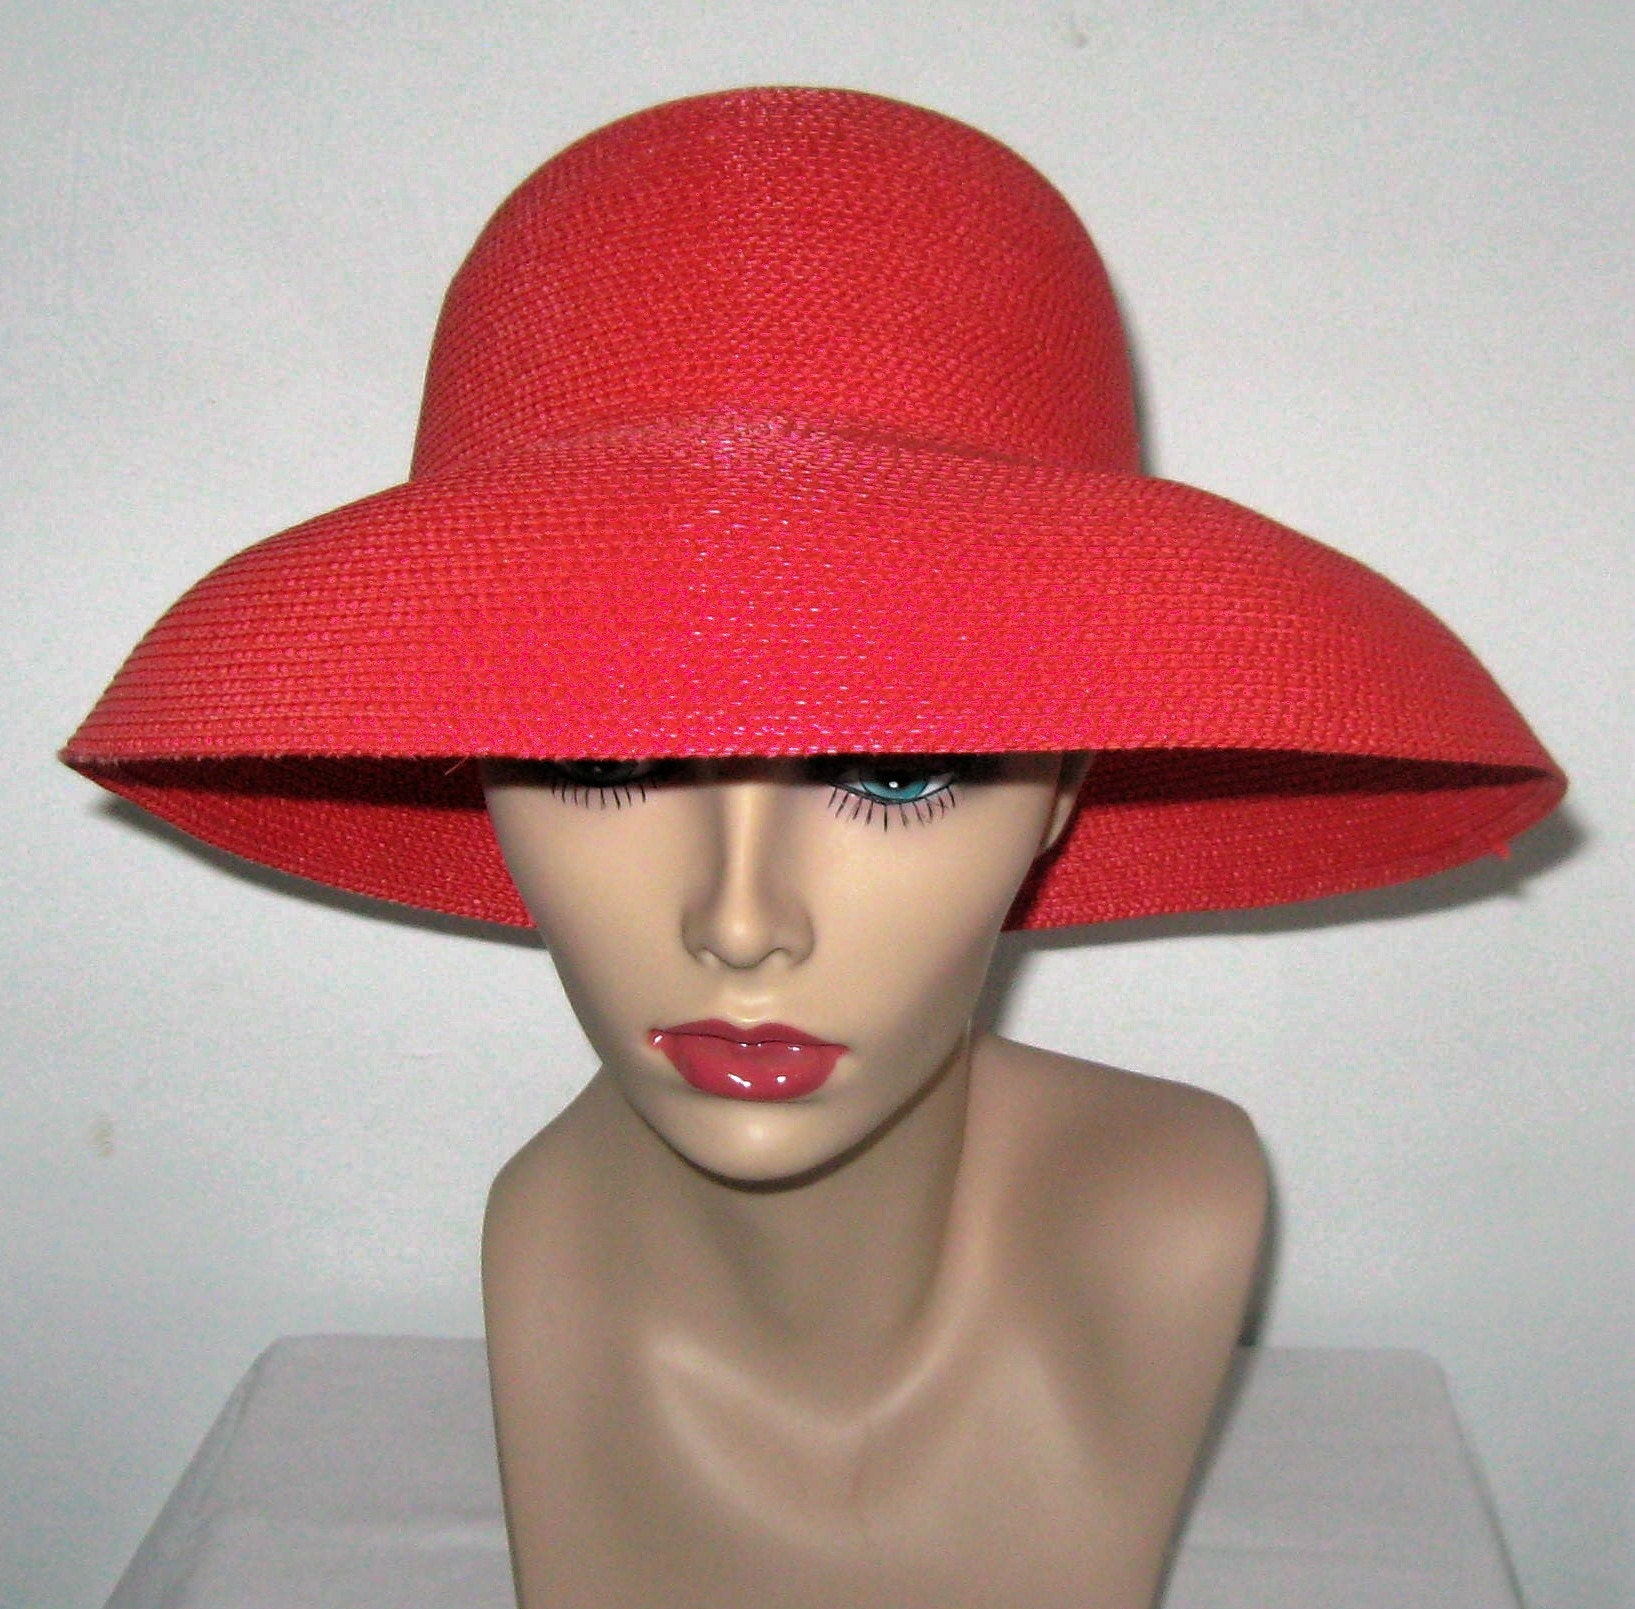 VINTAGE FABULOUS CORAL RED FLIP HAT 1960/70s